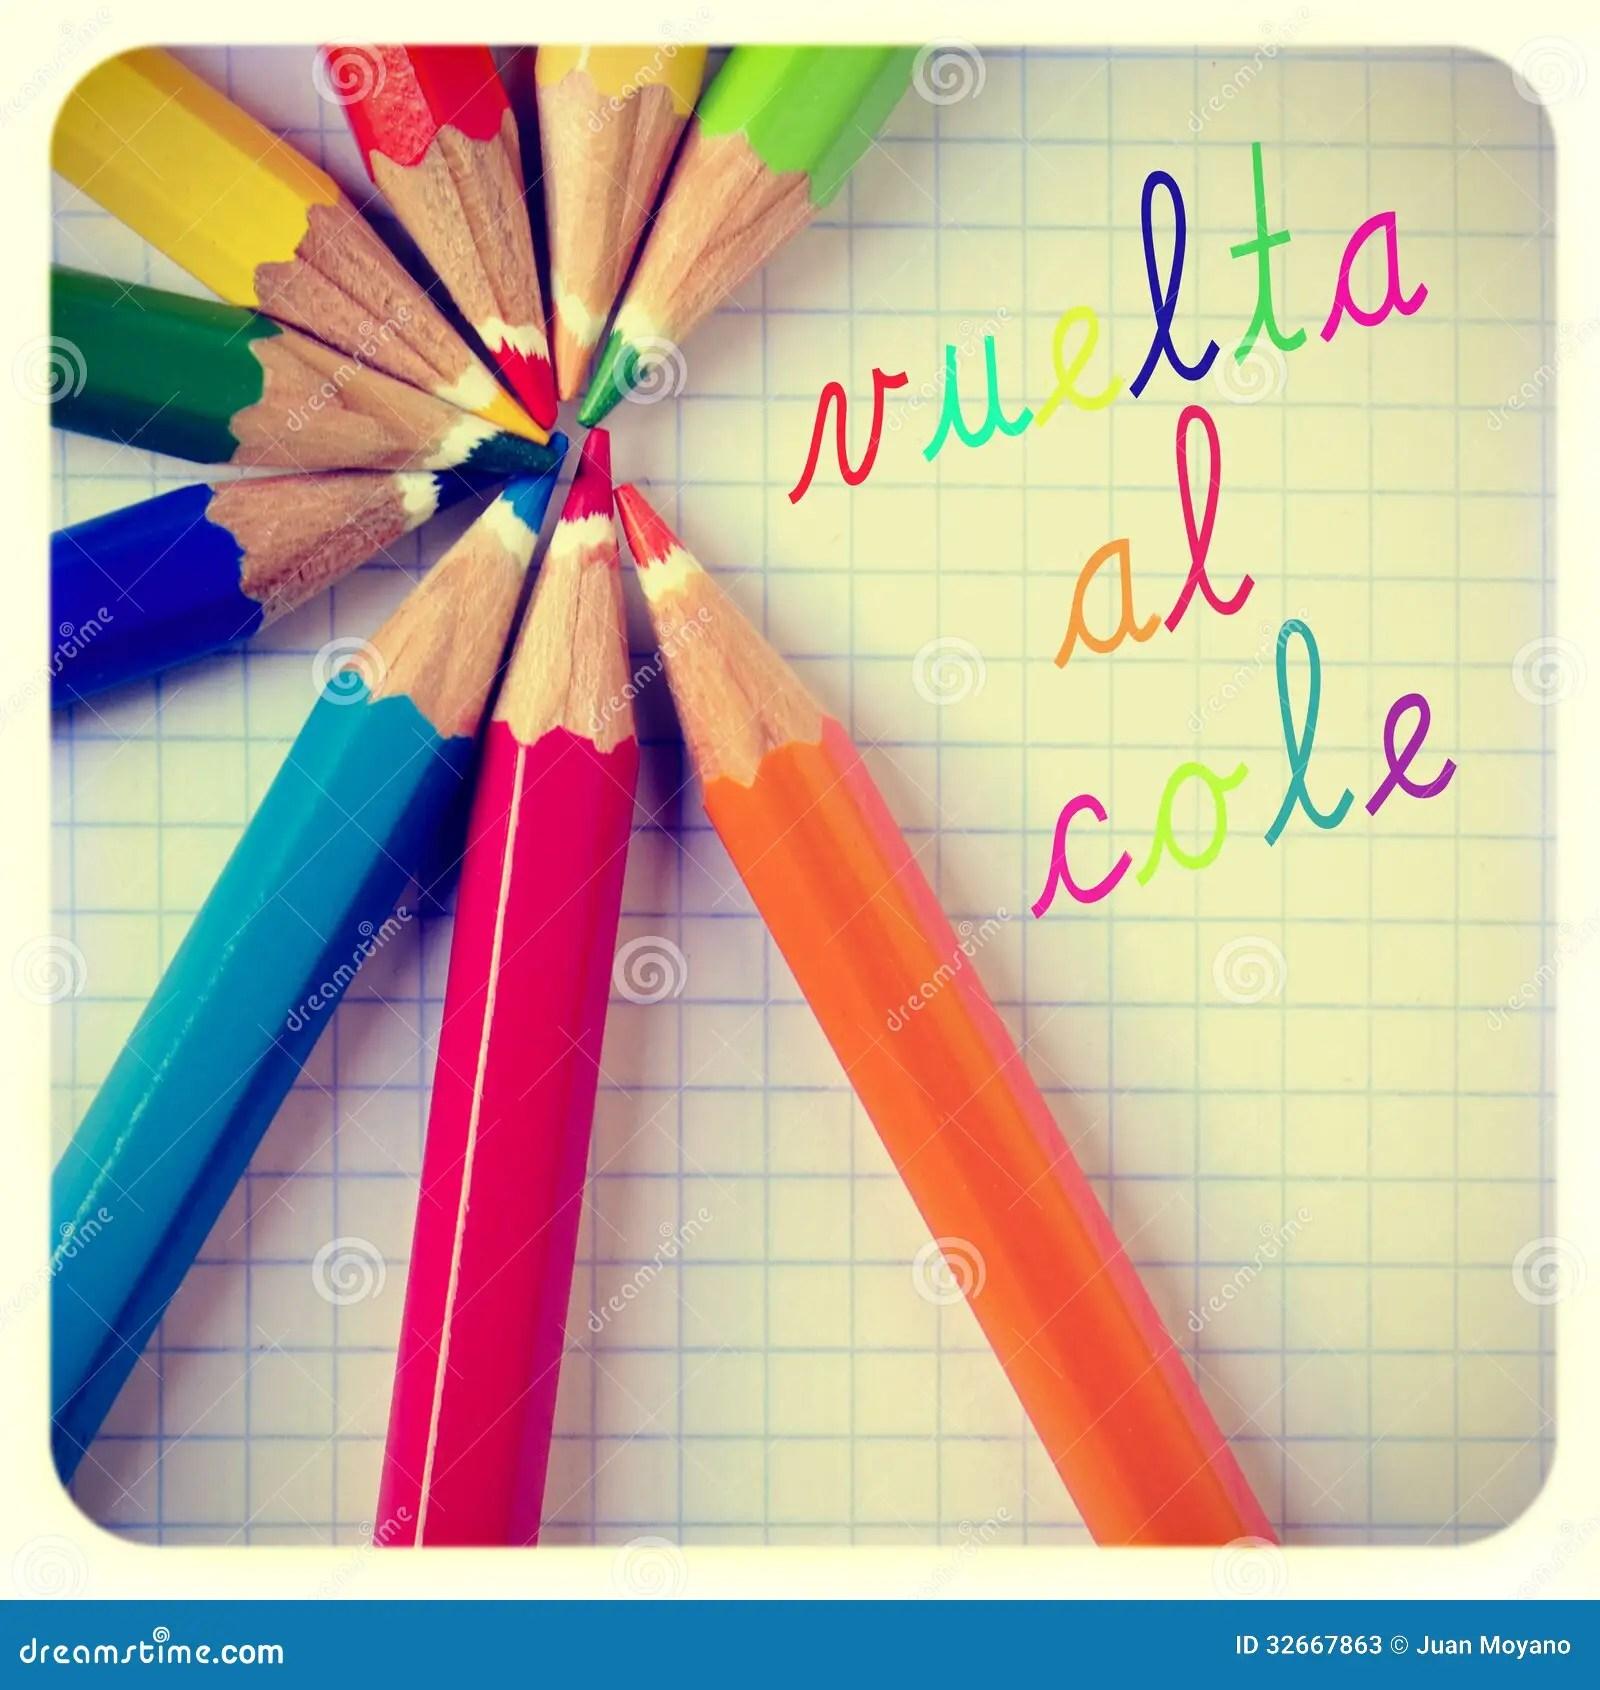 Vuelta Al Cole Back To School Written In Spanish Stock Image